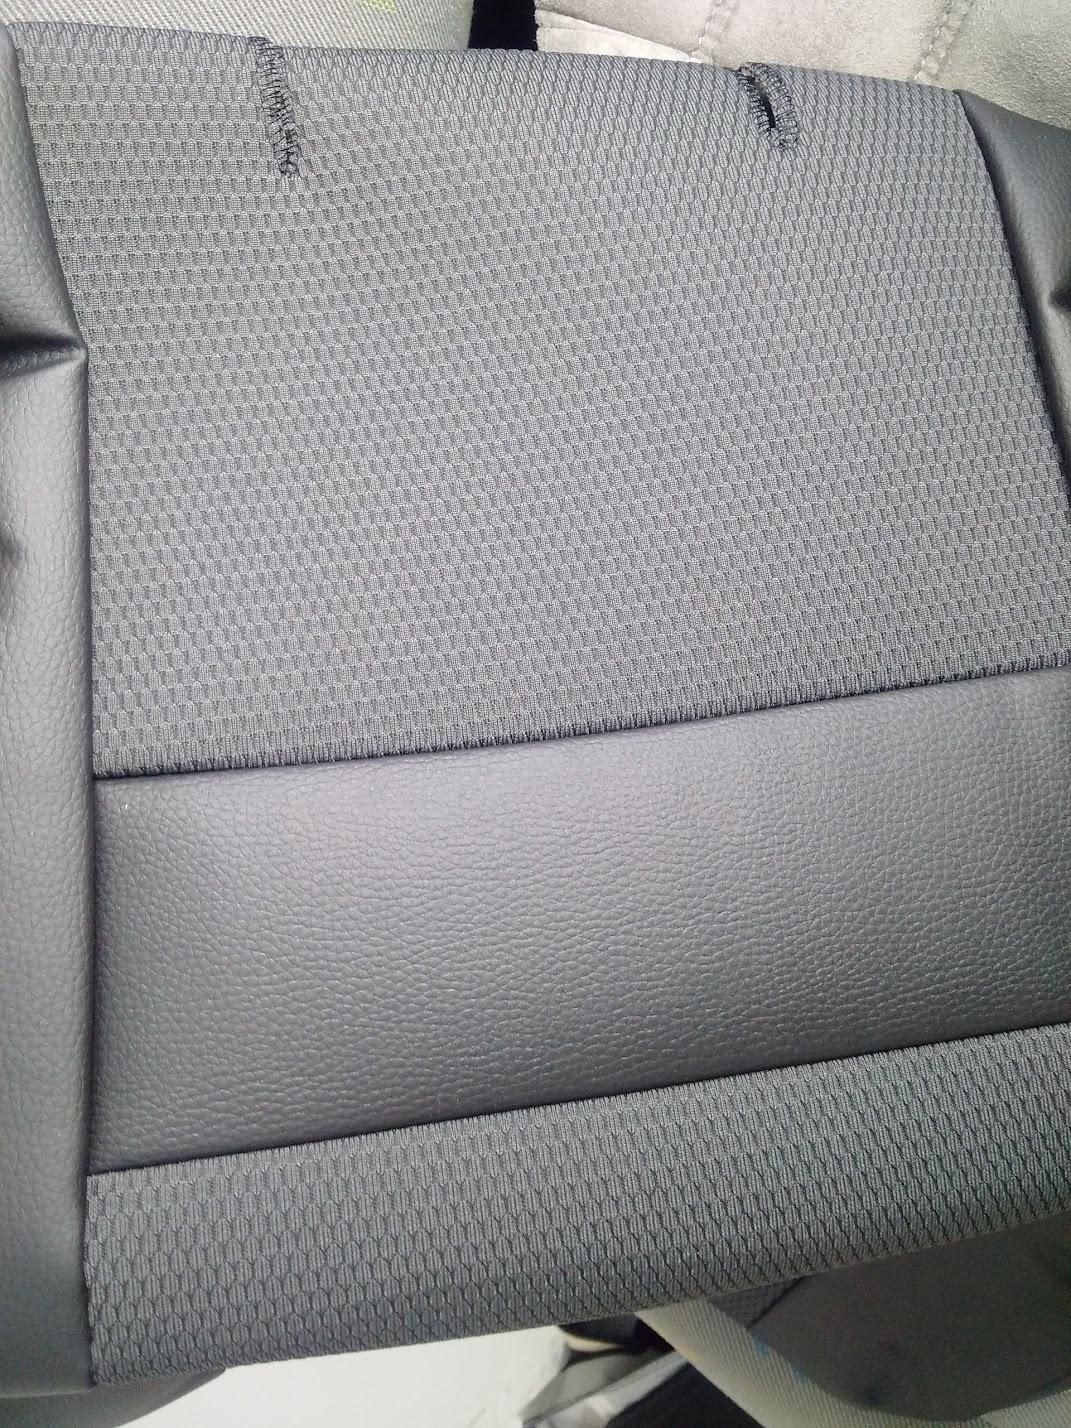 ANTHRACITE GREY VAN SEAT COVERS FORD TRANSIT CUSTOM 2013-19 ST LOGO